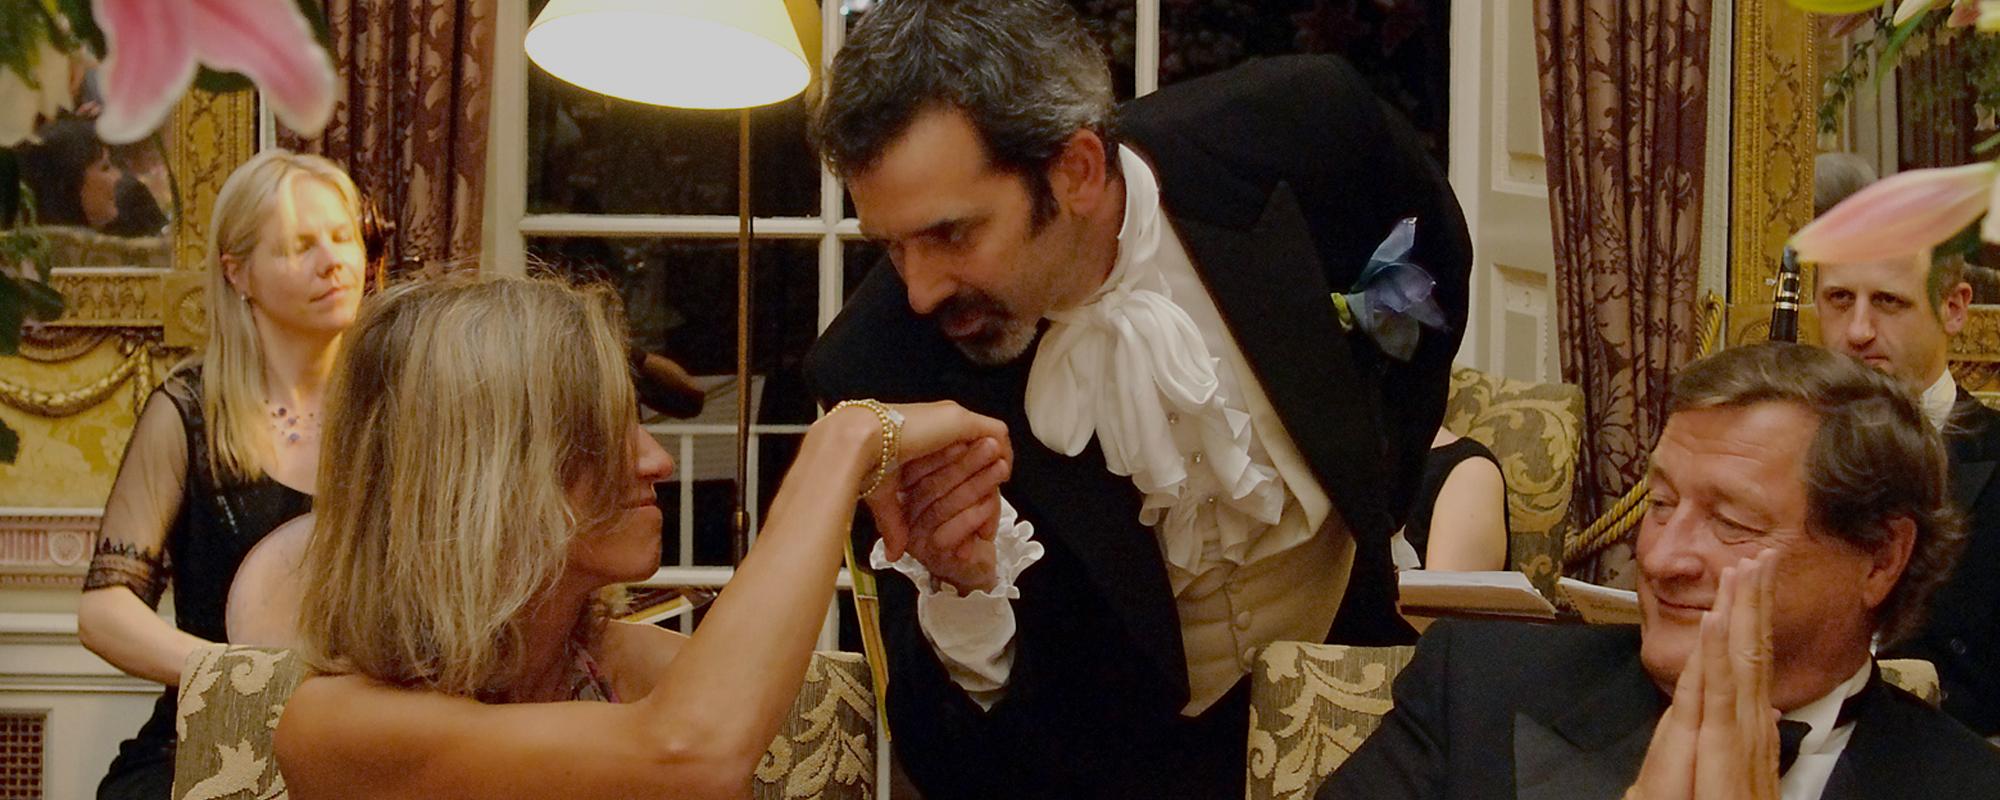 London Festival Opera Singing Waiters